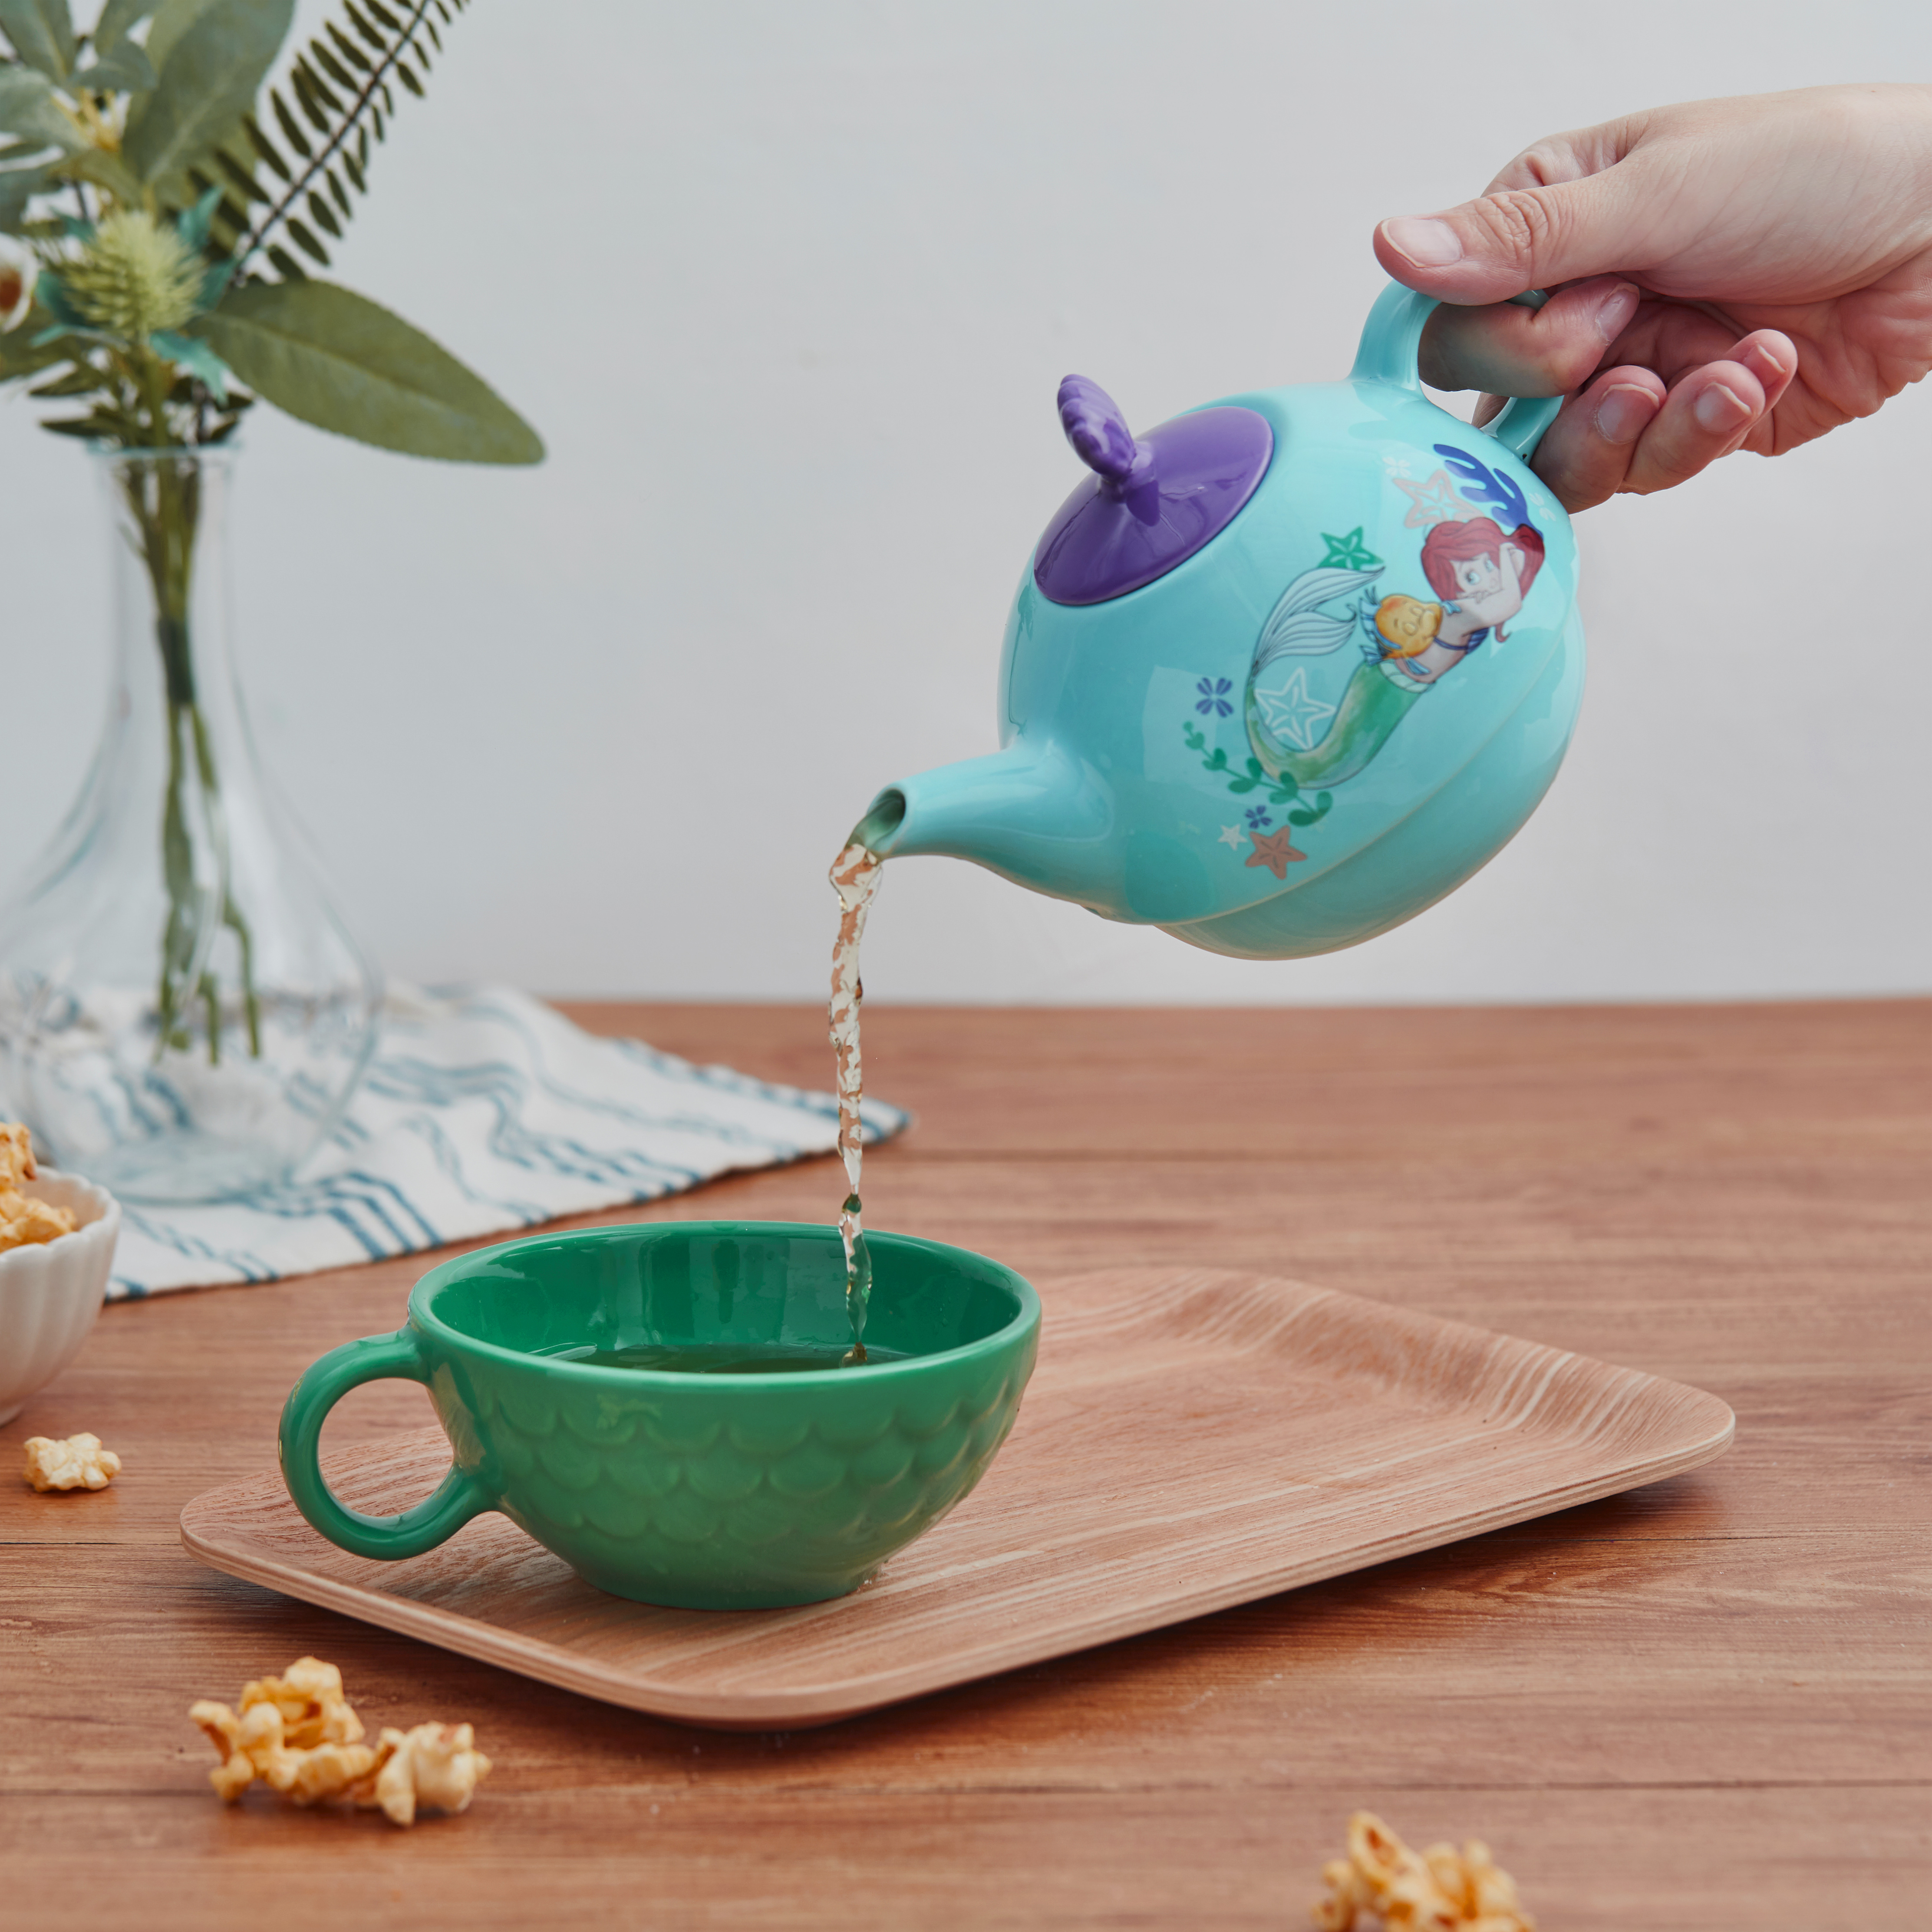 Disney The Little Mermaid Sculpted Ceramic Tea Set, Princess Ariel, 4-piece set slideshow image 5